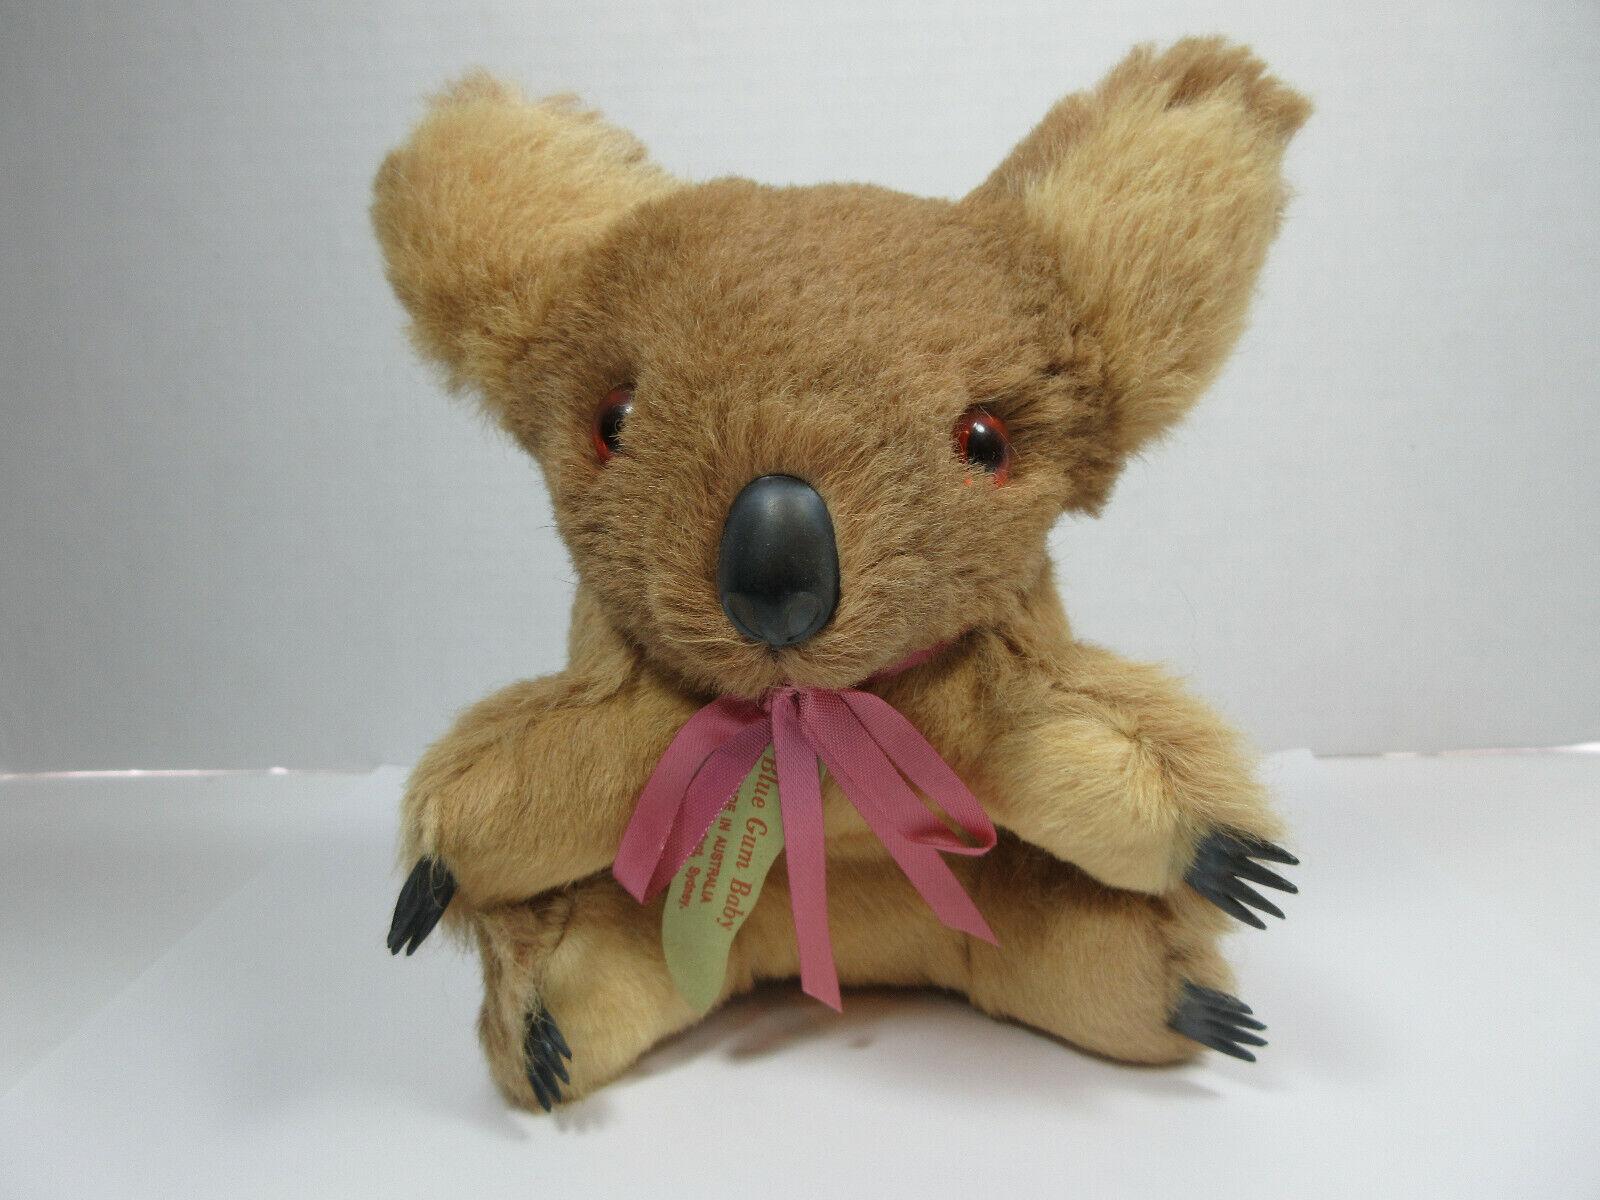 VINTAGE MORELLA PRODUCT SOUVENIR SYDNEY AUSTRALIA blueE GUM BABY KOALA BEAR DECOR